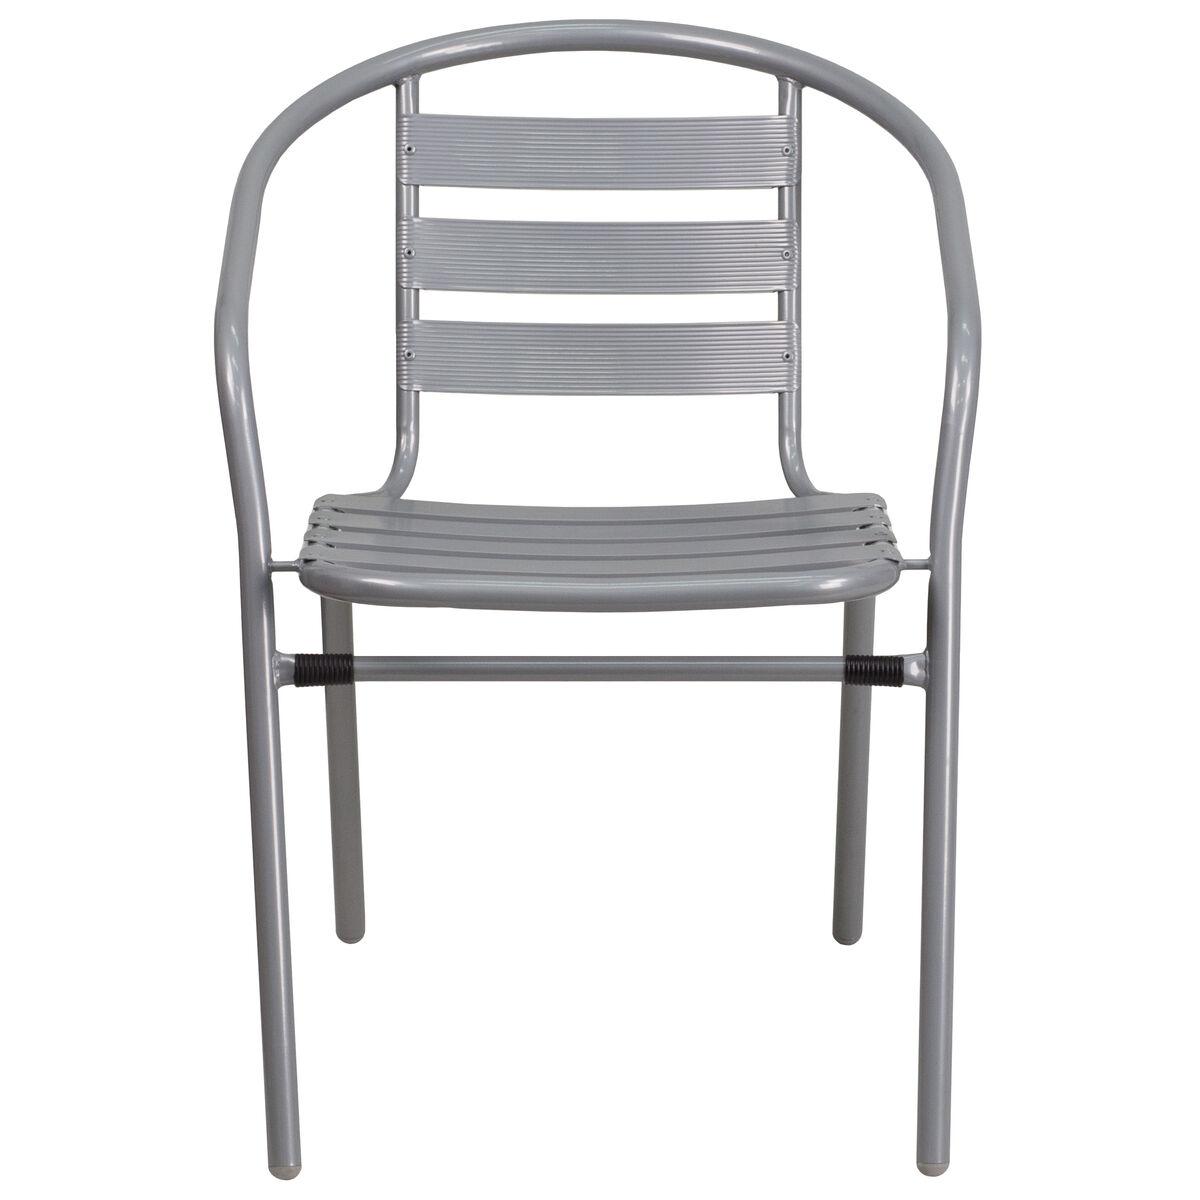 Silver Chair W Aluminum Slats Tlh 017c Gg Bizchair Com